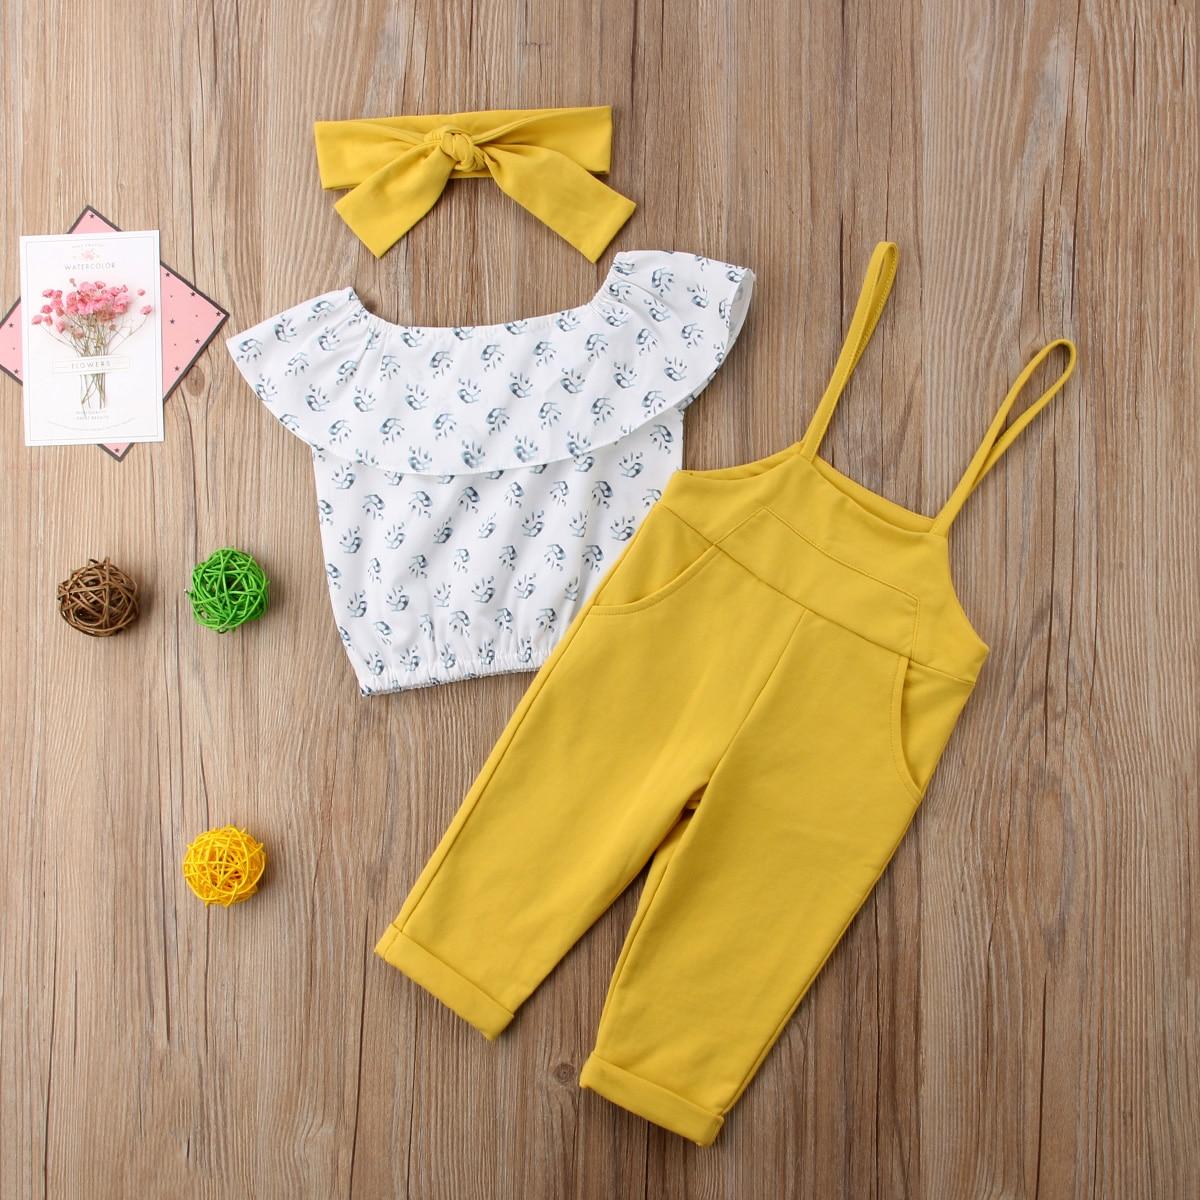 Girls Summer Clothes Sleeveless Tassels Ruffle Romper+Flora Shorts Baby Set